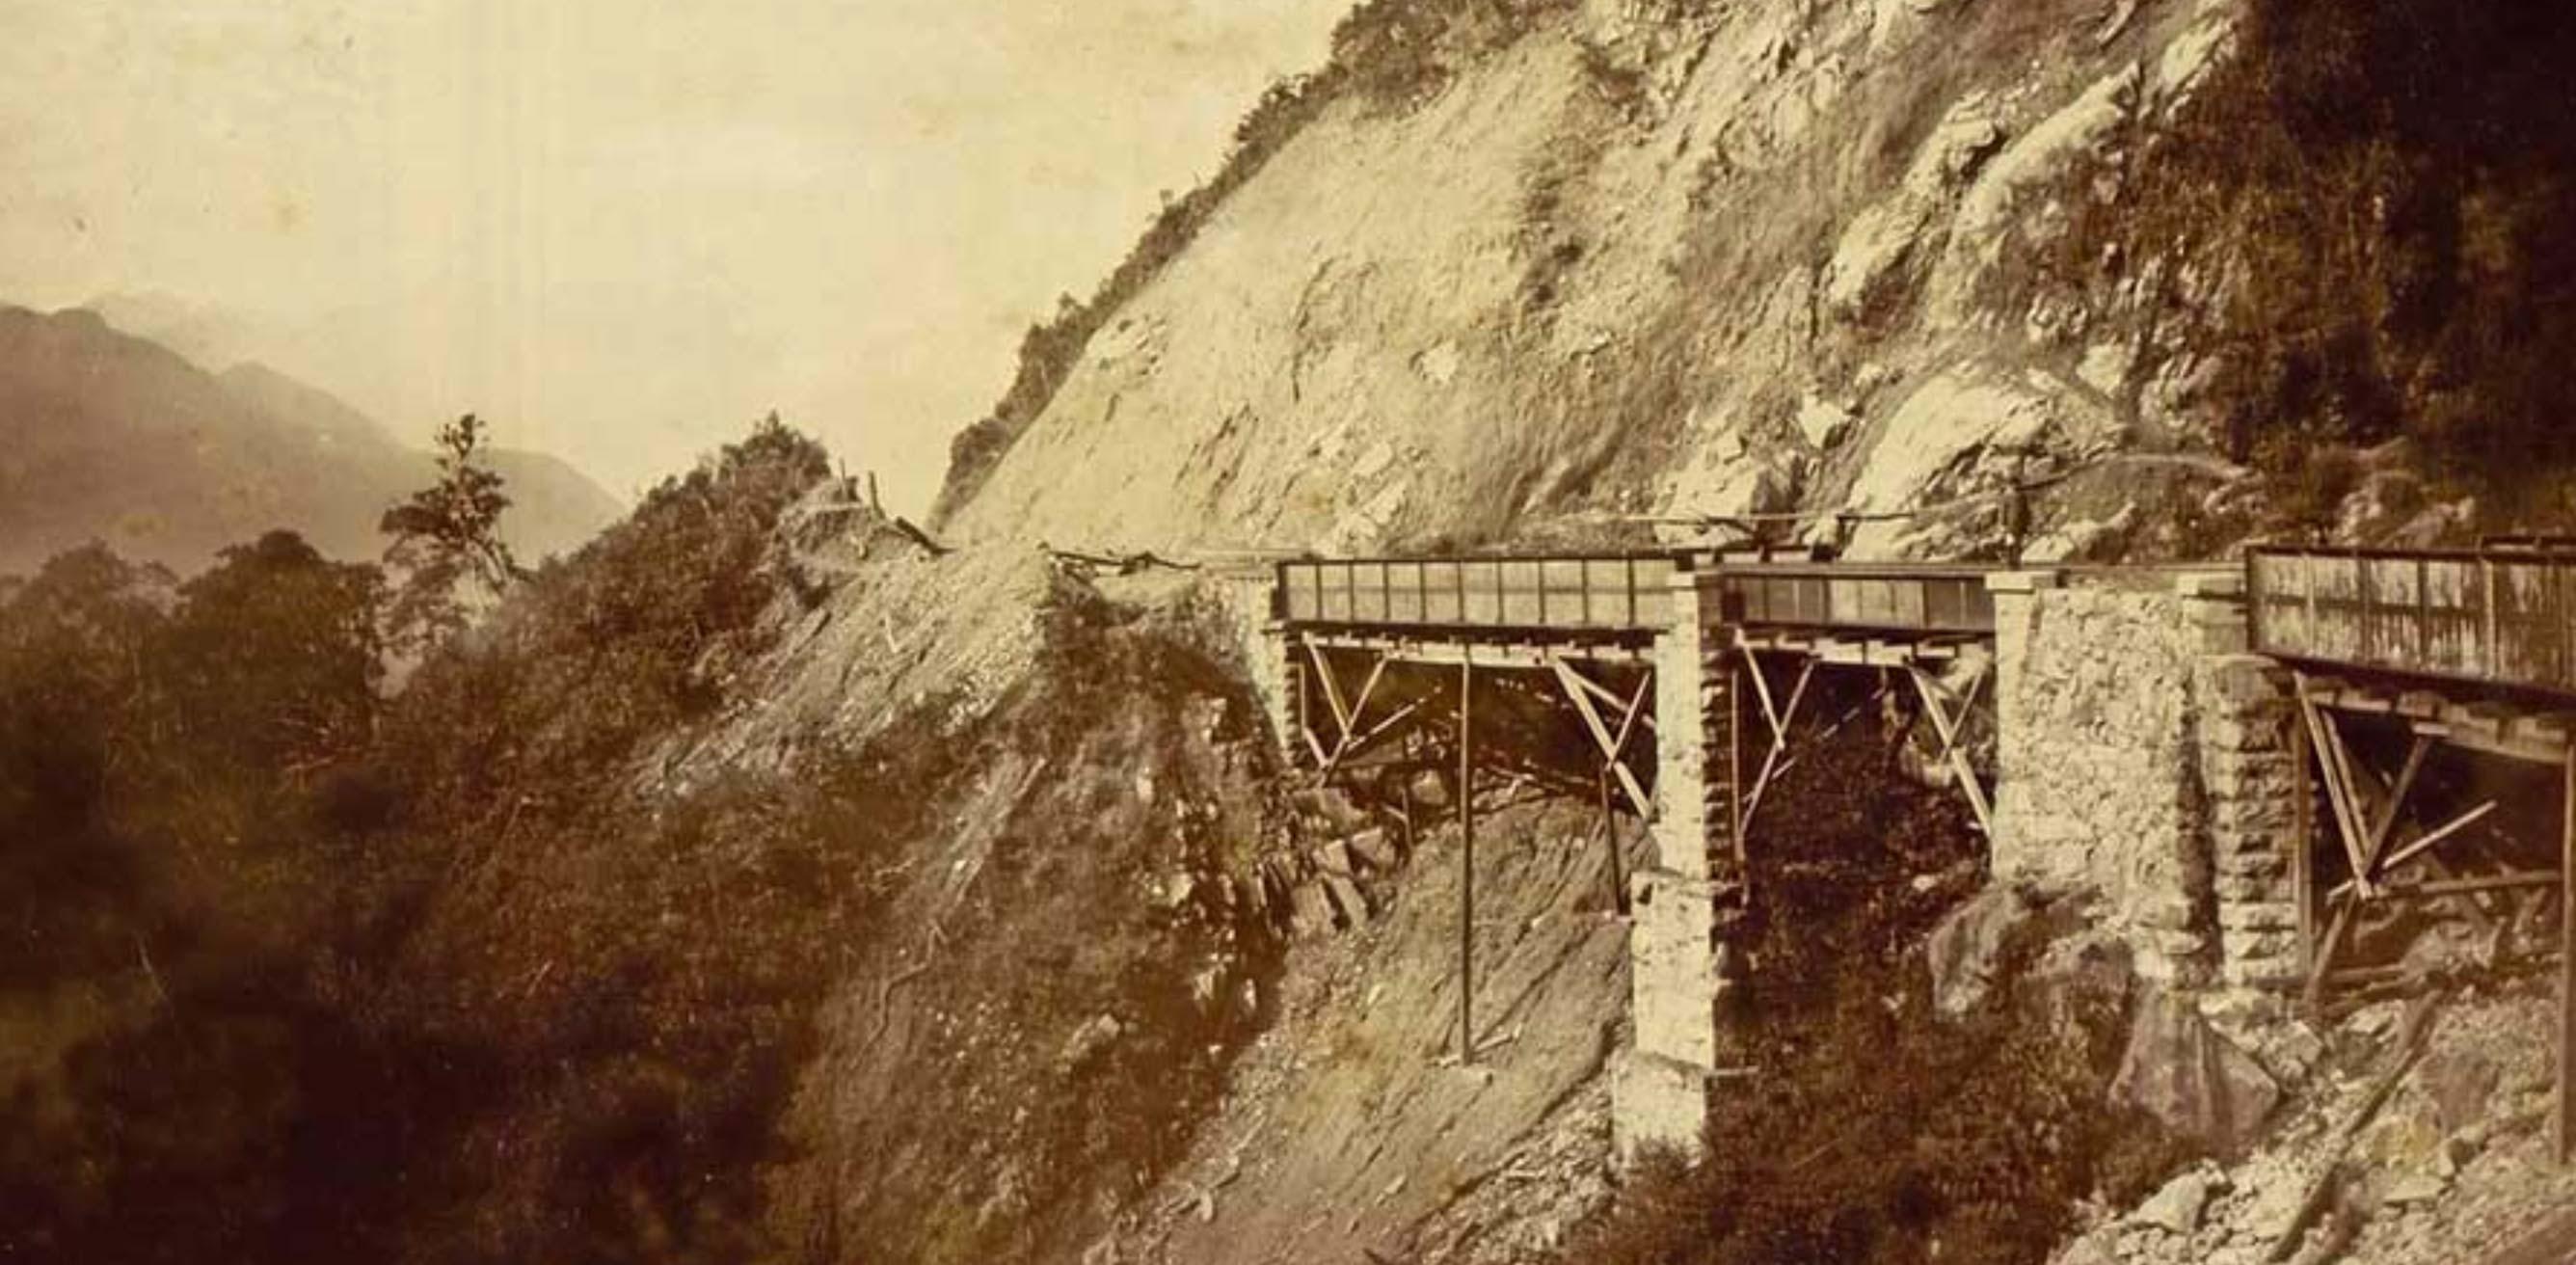 Curitiba-Moretes Railroad and the Carvalho Viaduct